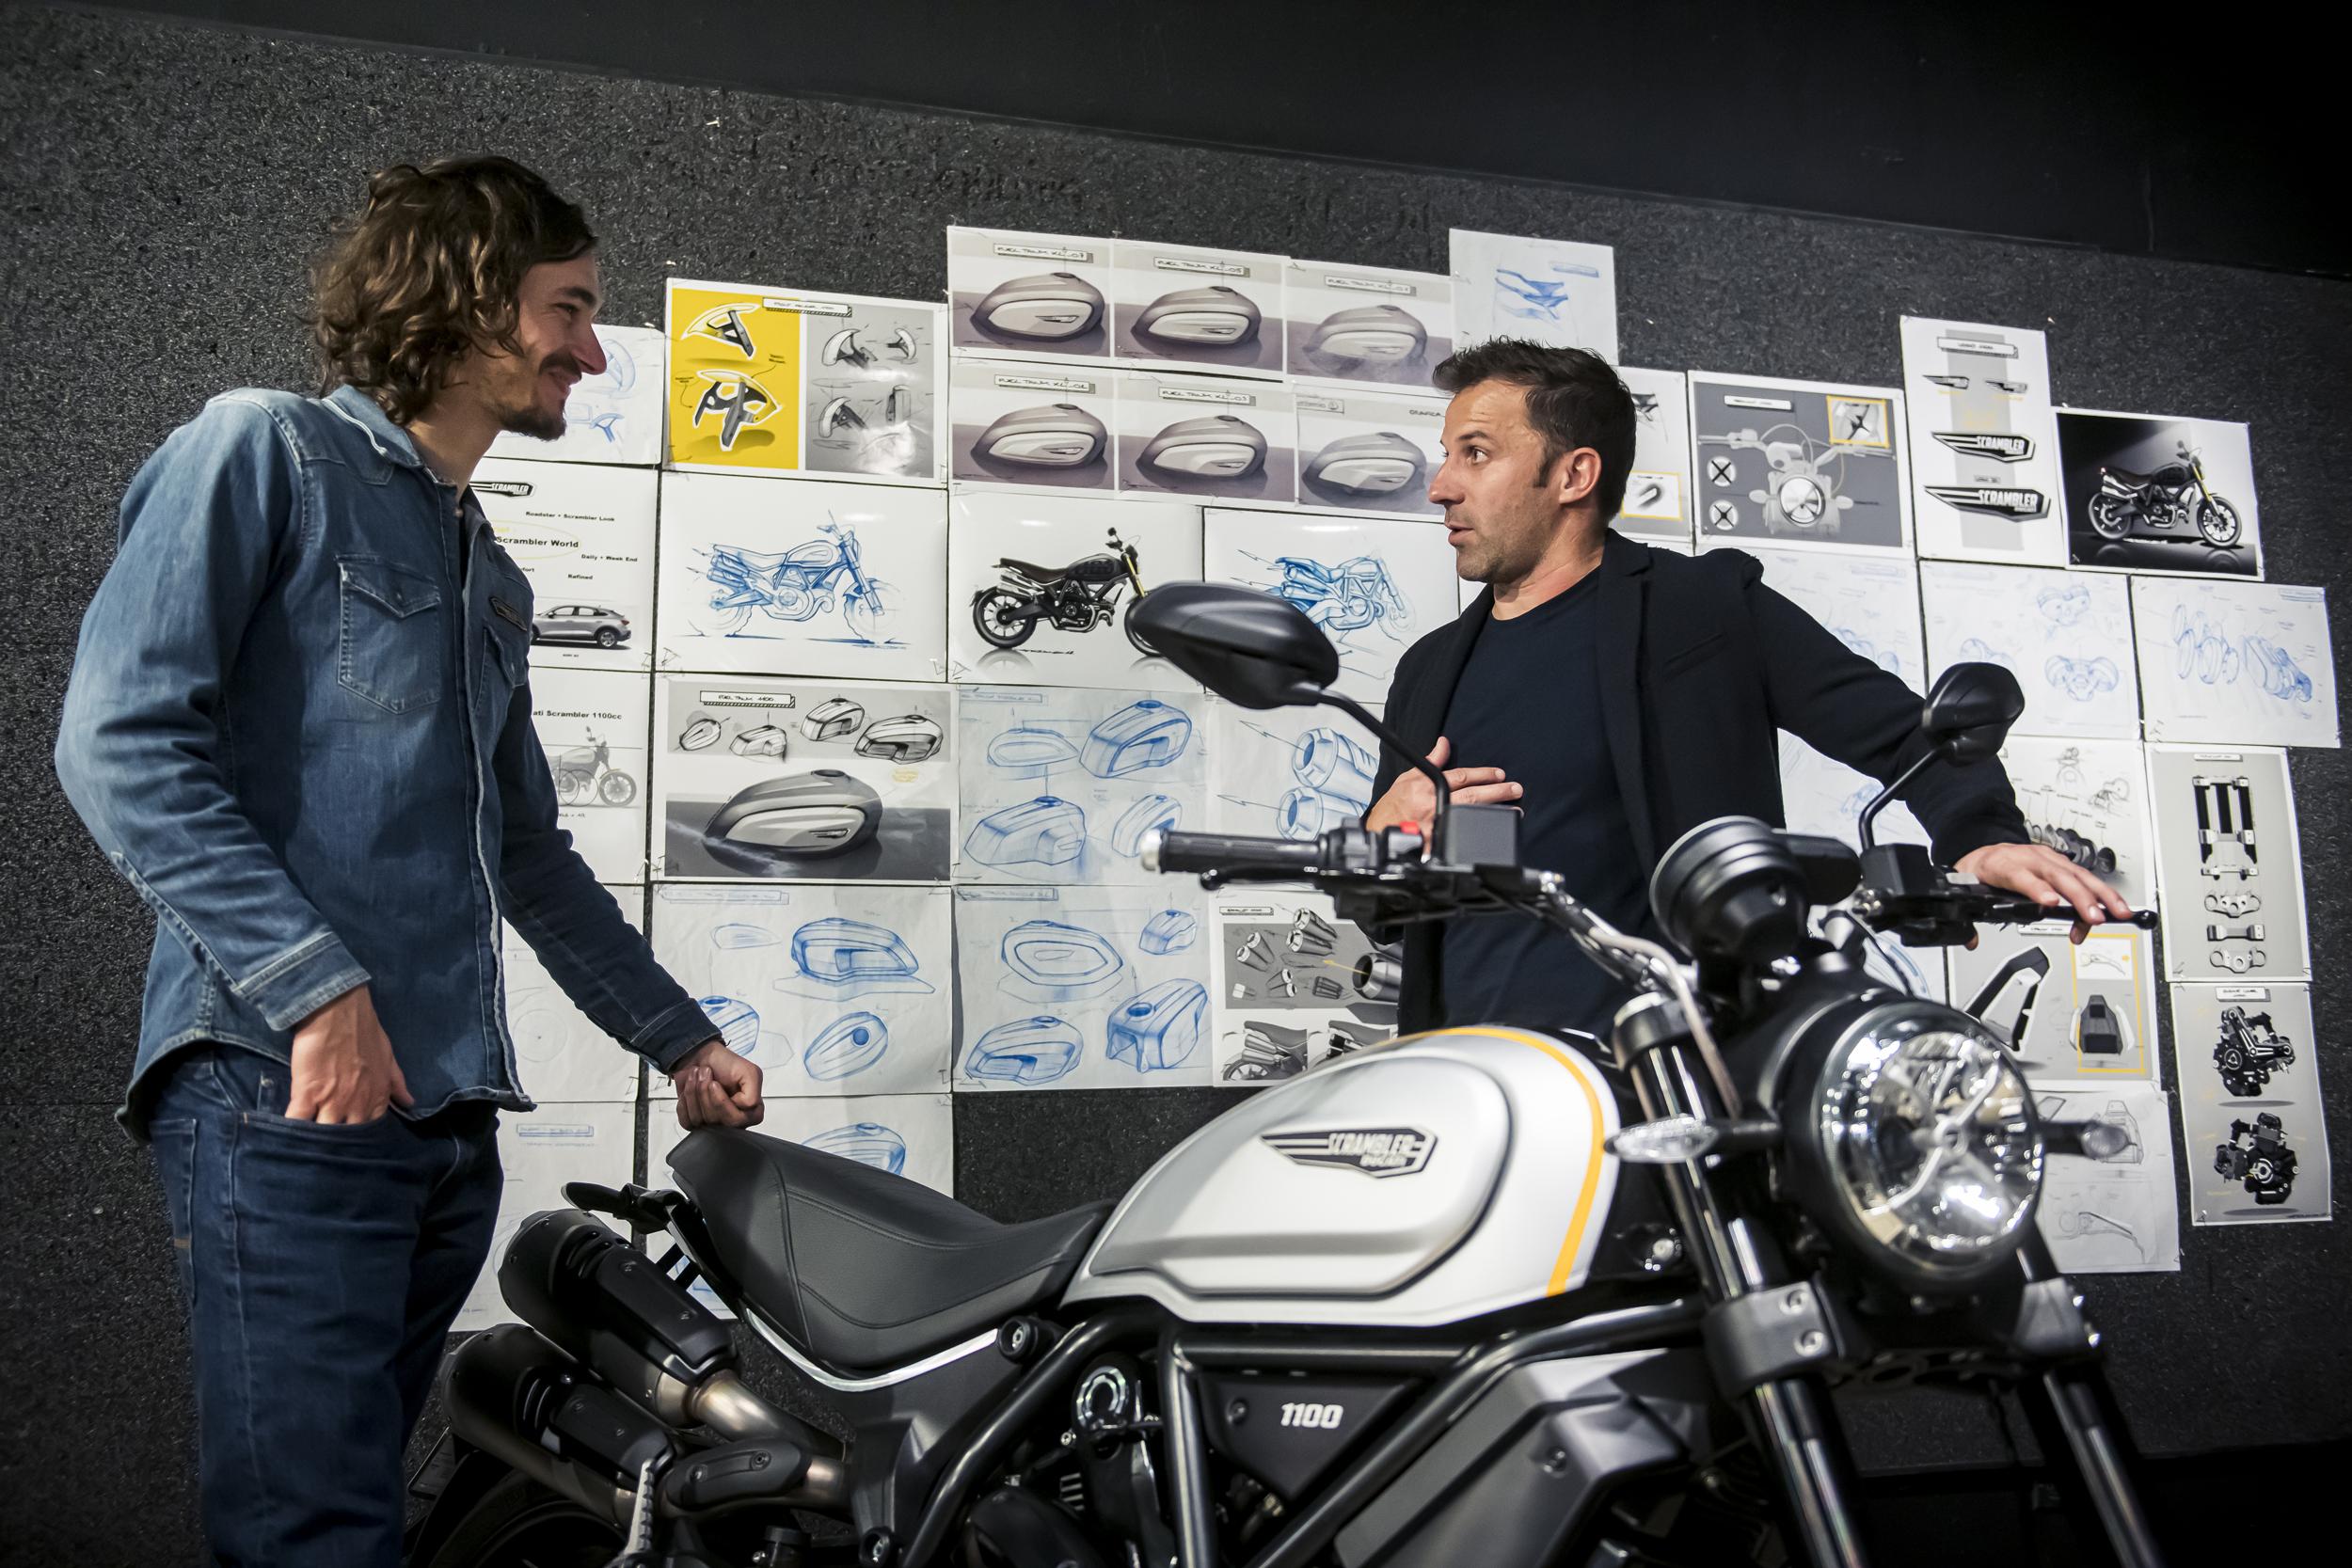 Jeremy Faraud and Alessandro Del Piero [6]